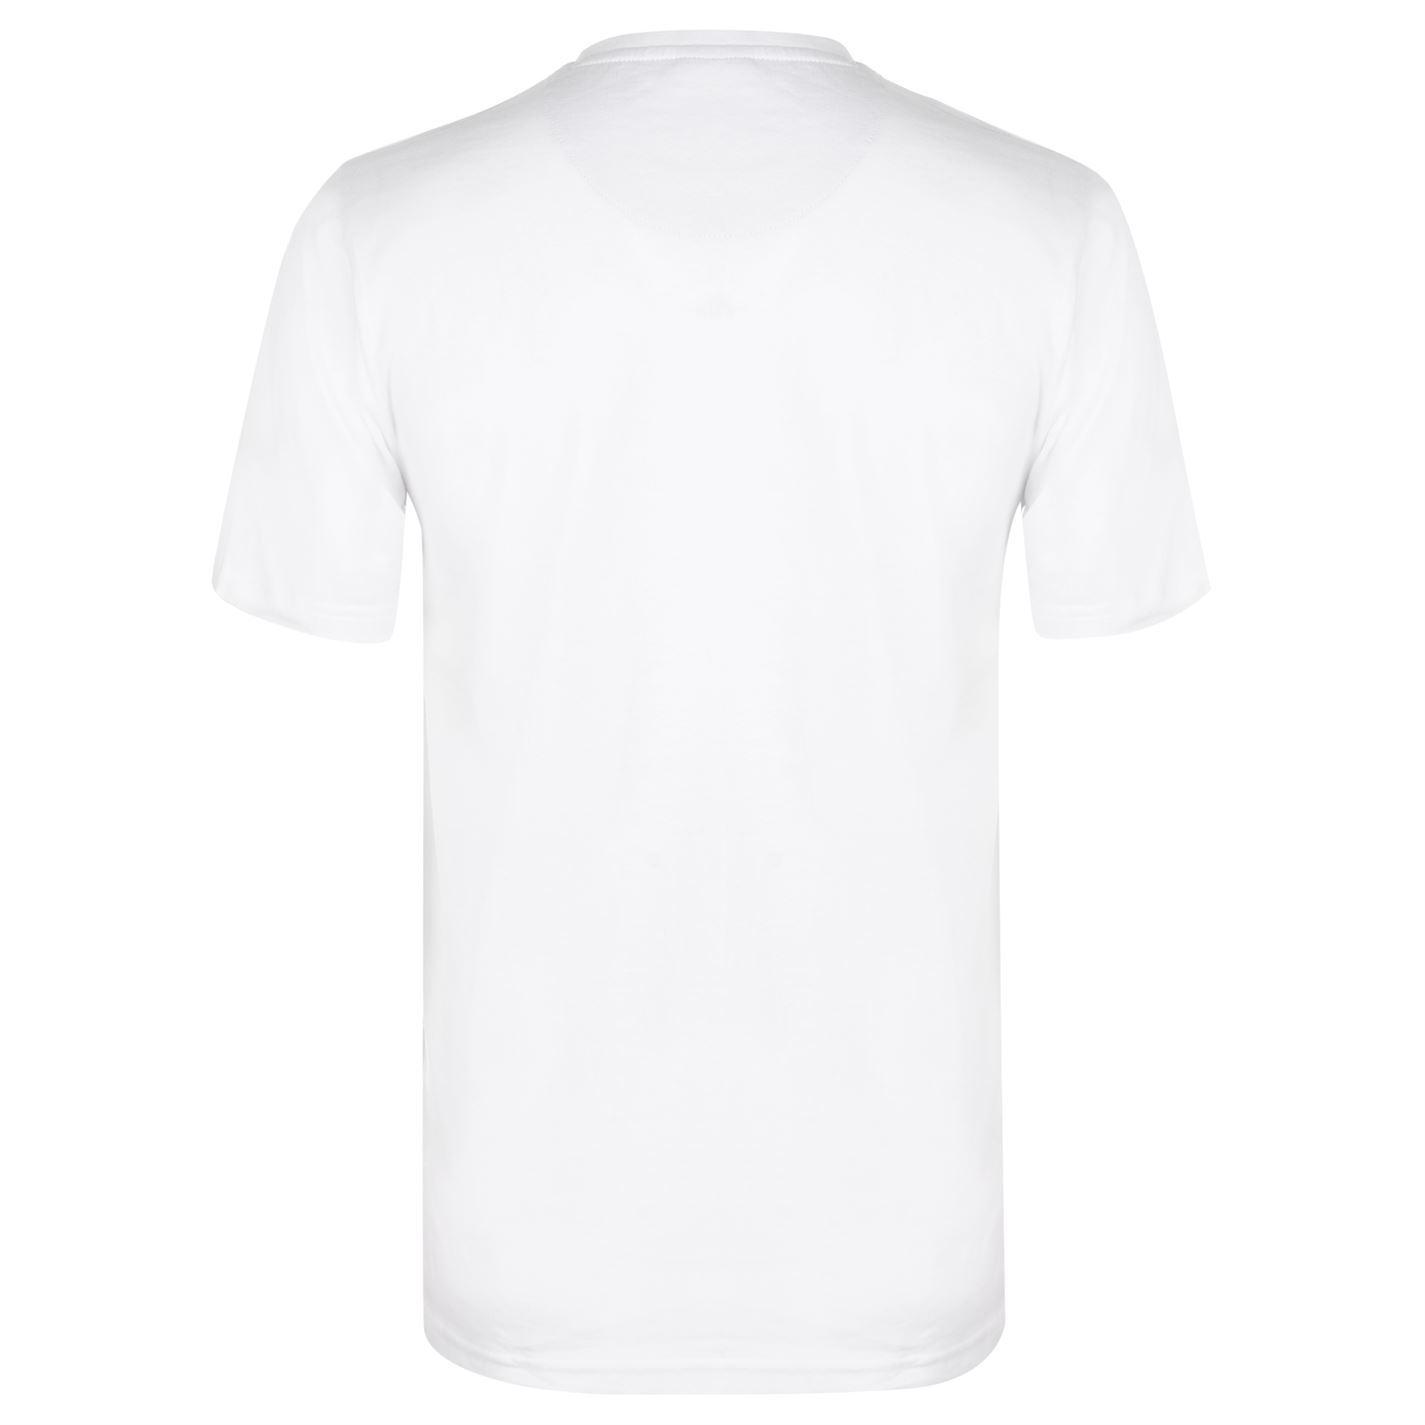 65bbe565 ... Pierre Cardin Contrast Henley T-Shirt Mens White Tee Shirt Tshirt Top